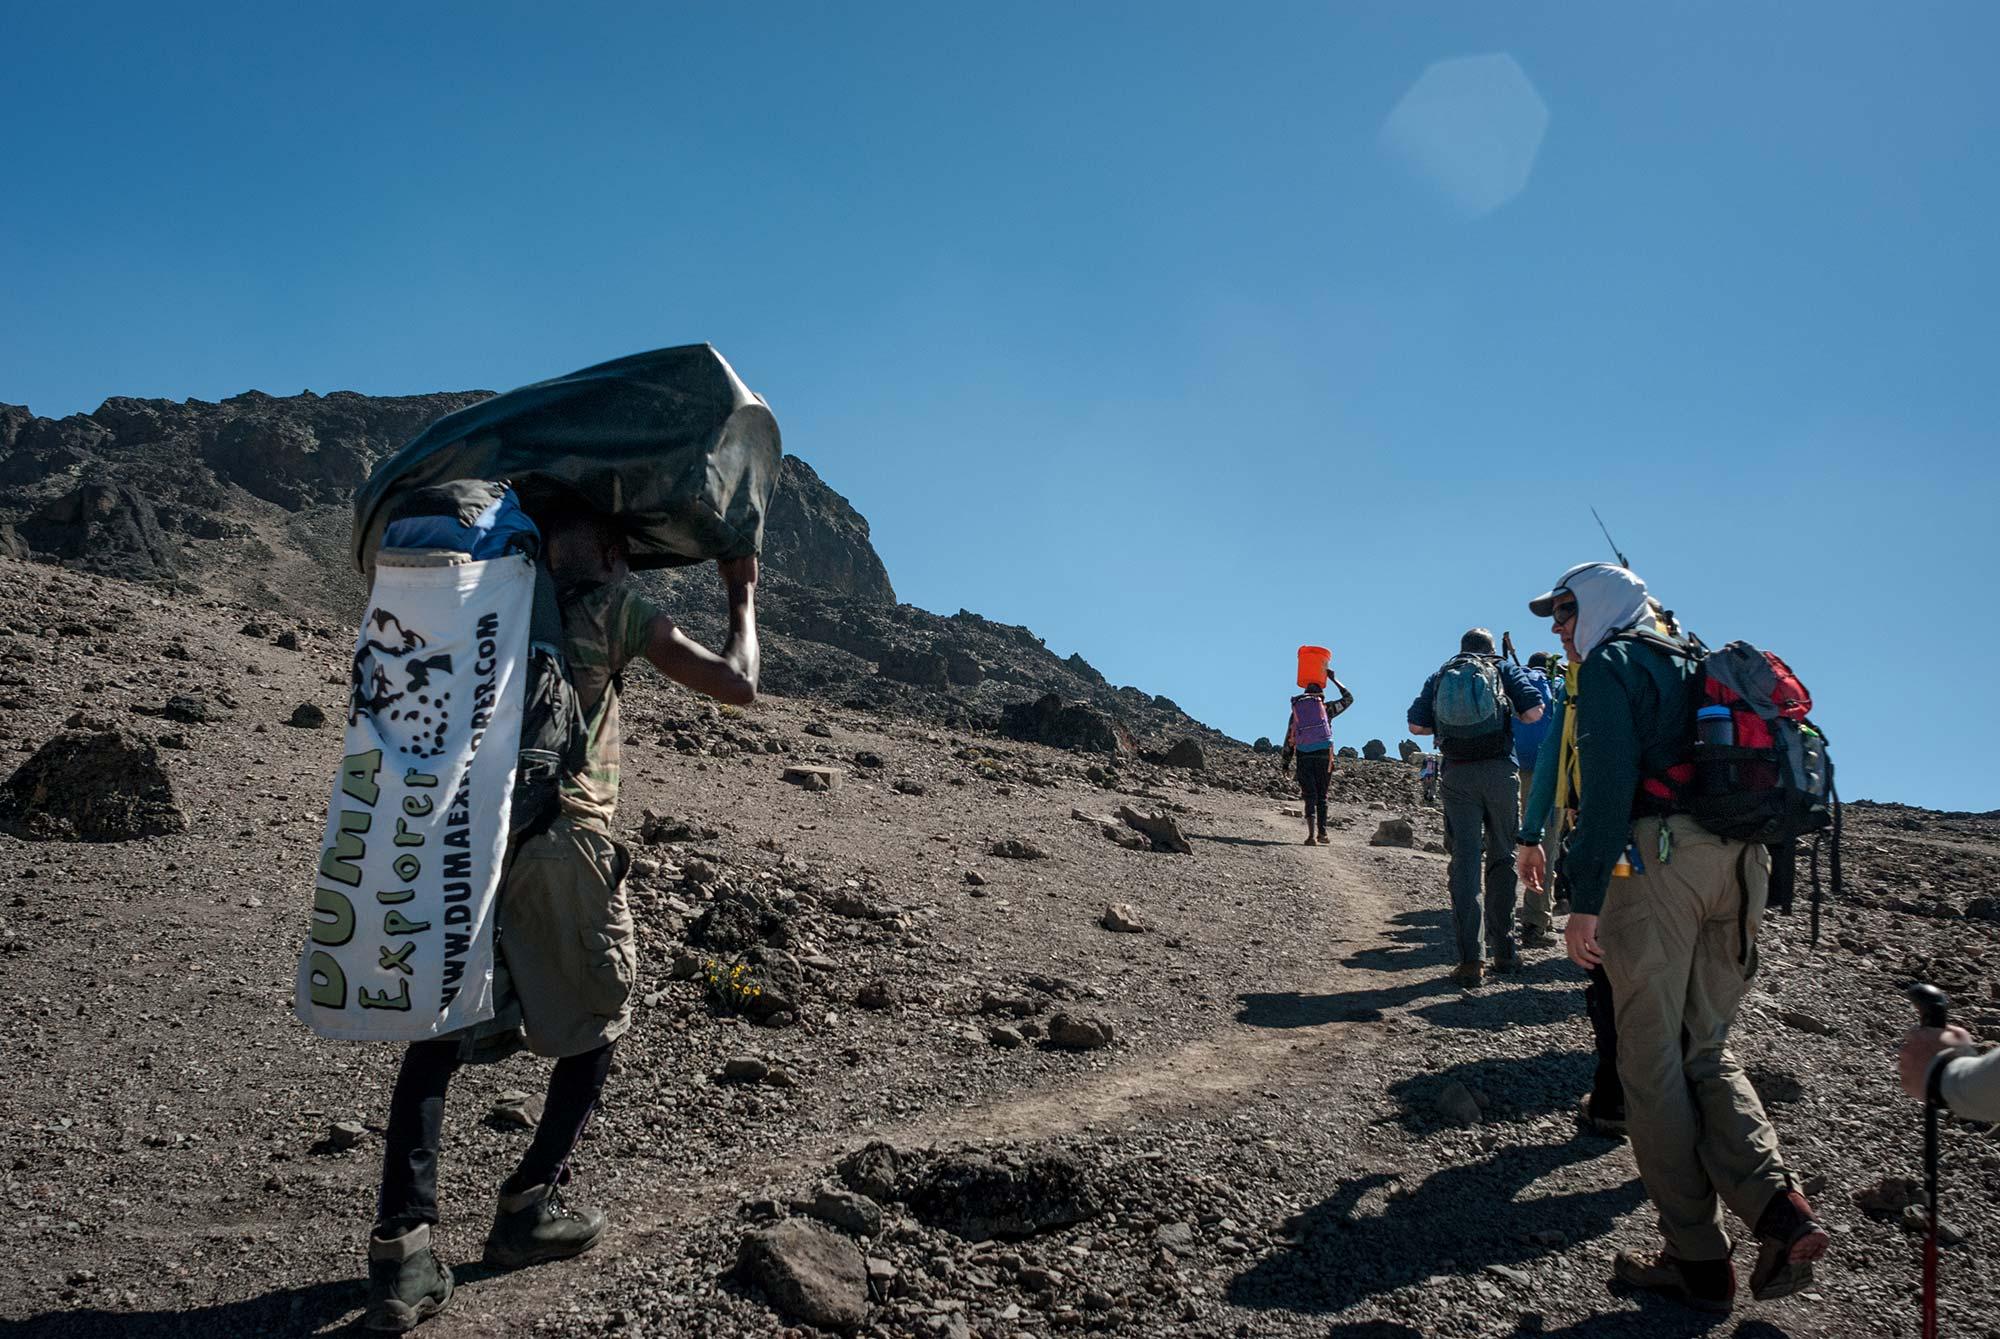 D6-28-dickson-carries-the-team-flag-karanga-to-barufu-camp-kilimanjaro.jpg